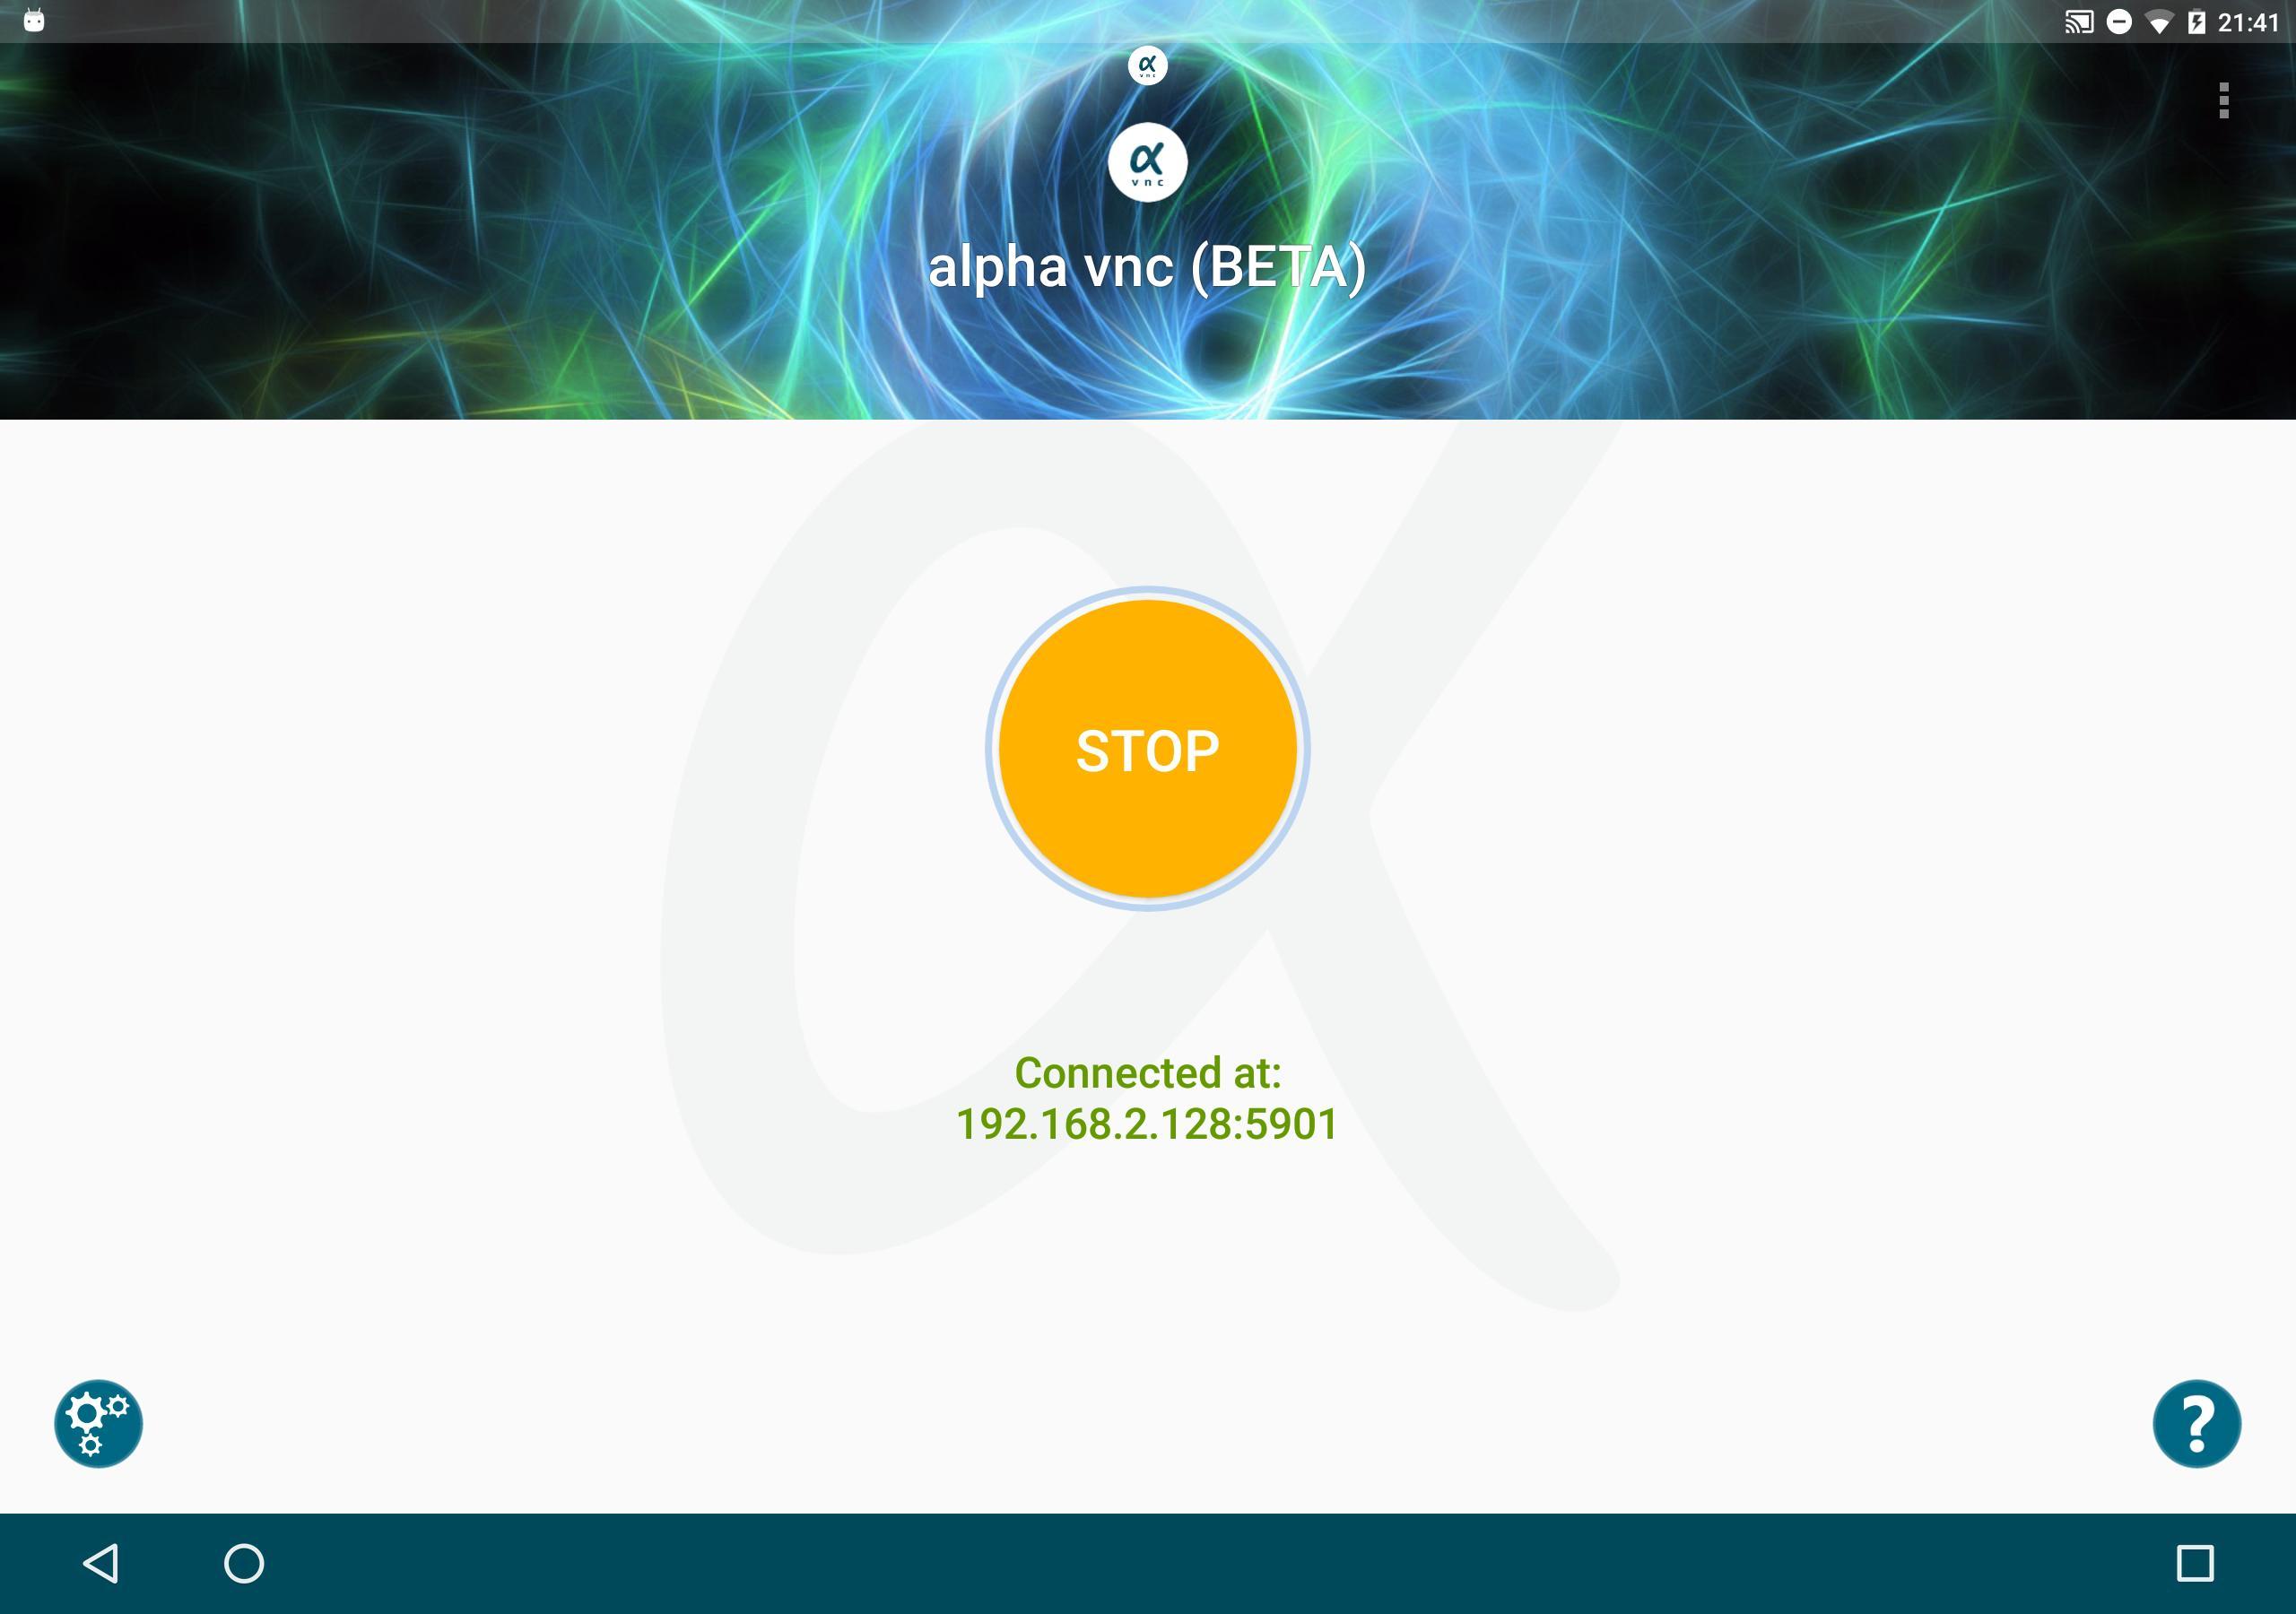 alpha vnc lite for Android - APK Download